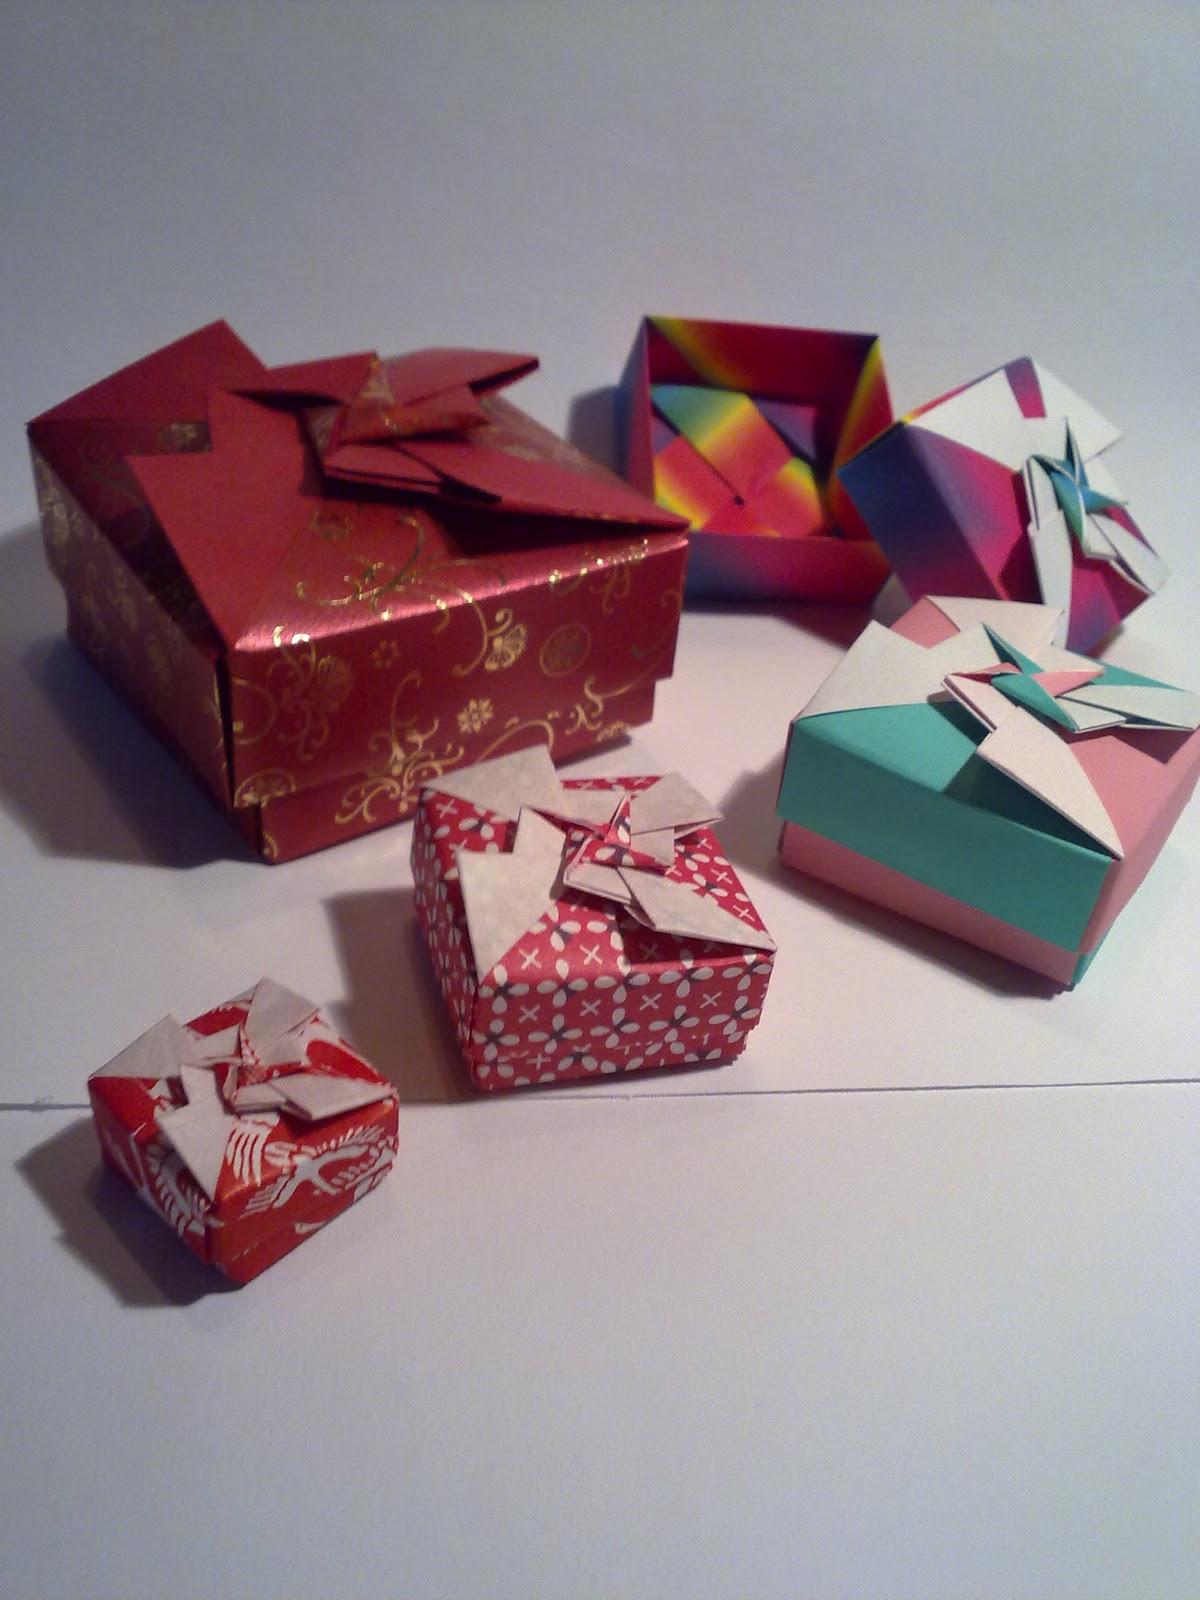 http://1.bp.blogspot.com/-56o_fXVjepw/TyqSd4eiv2I/AAAAAAAAAJY/Hz4CSmHgryY/s1600/Origami+Boxes.jpg